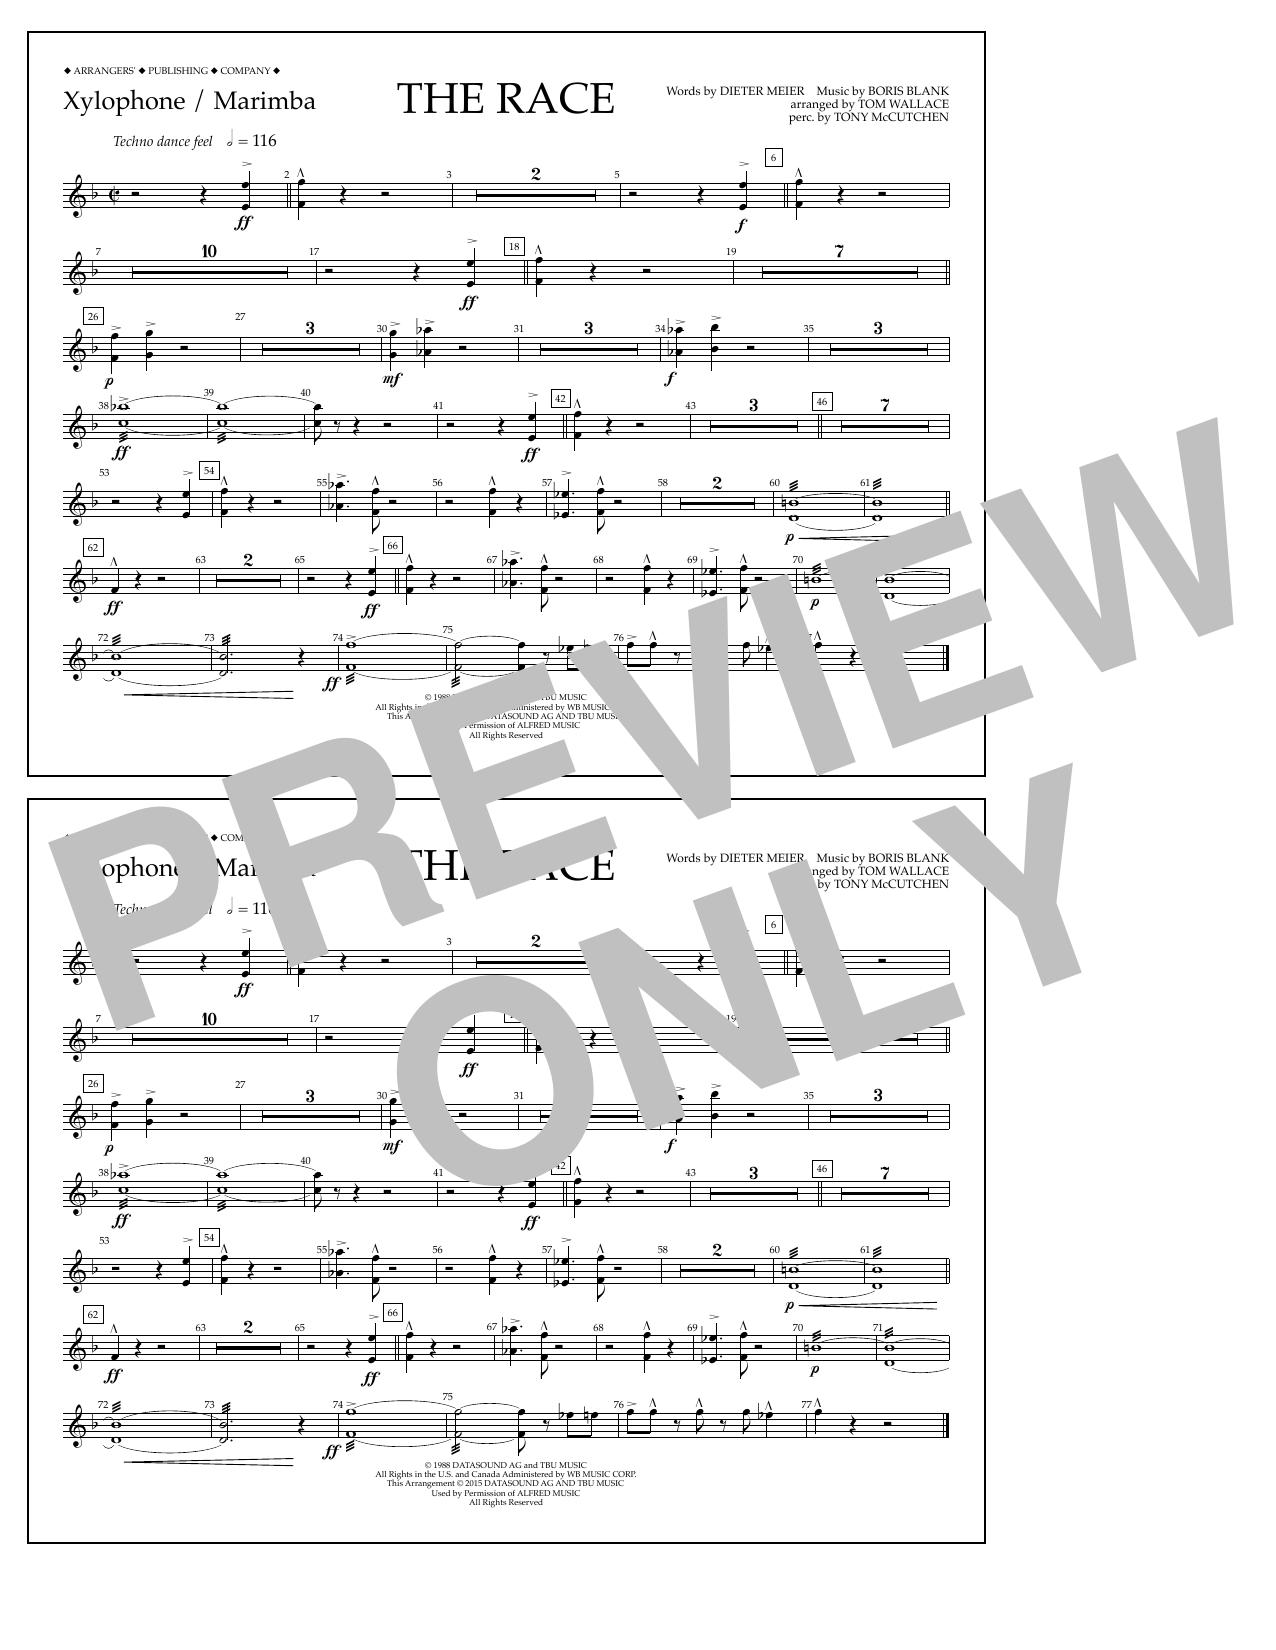 Dieter Meier - The Race - Xylophone/Marimba